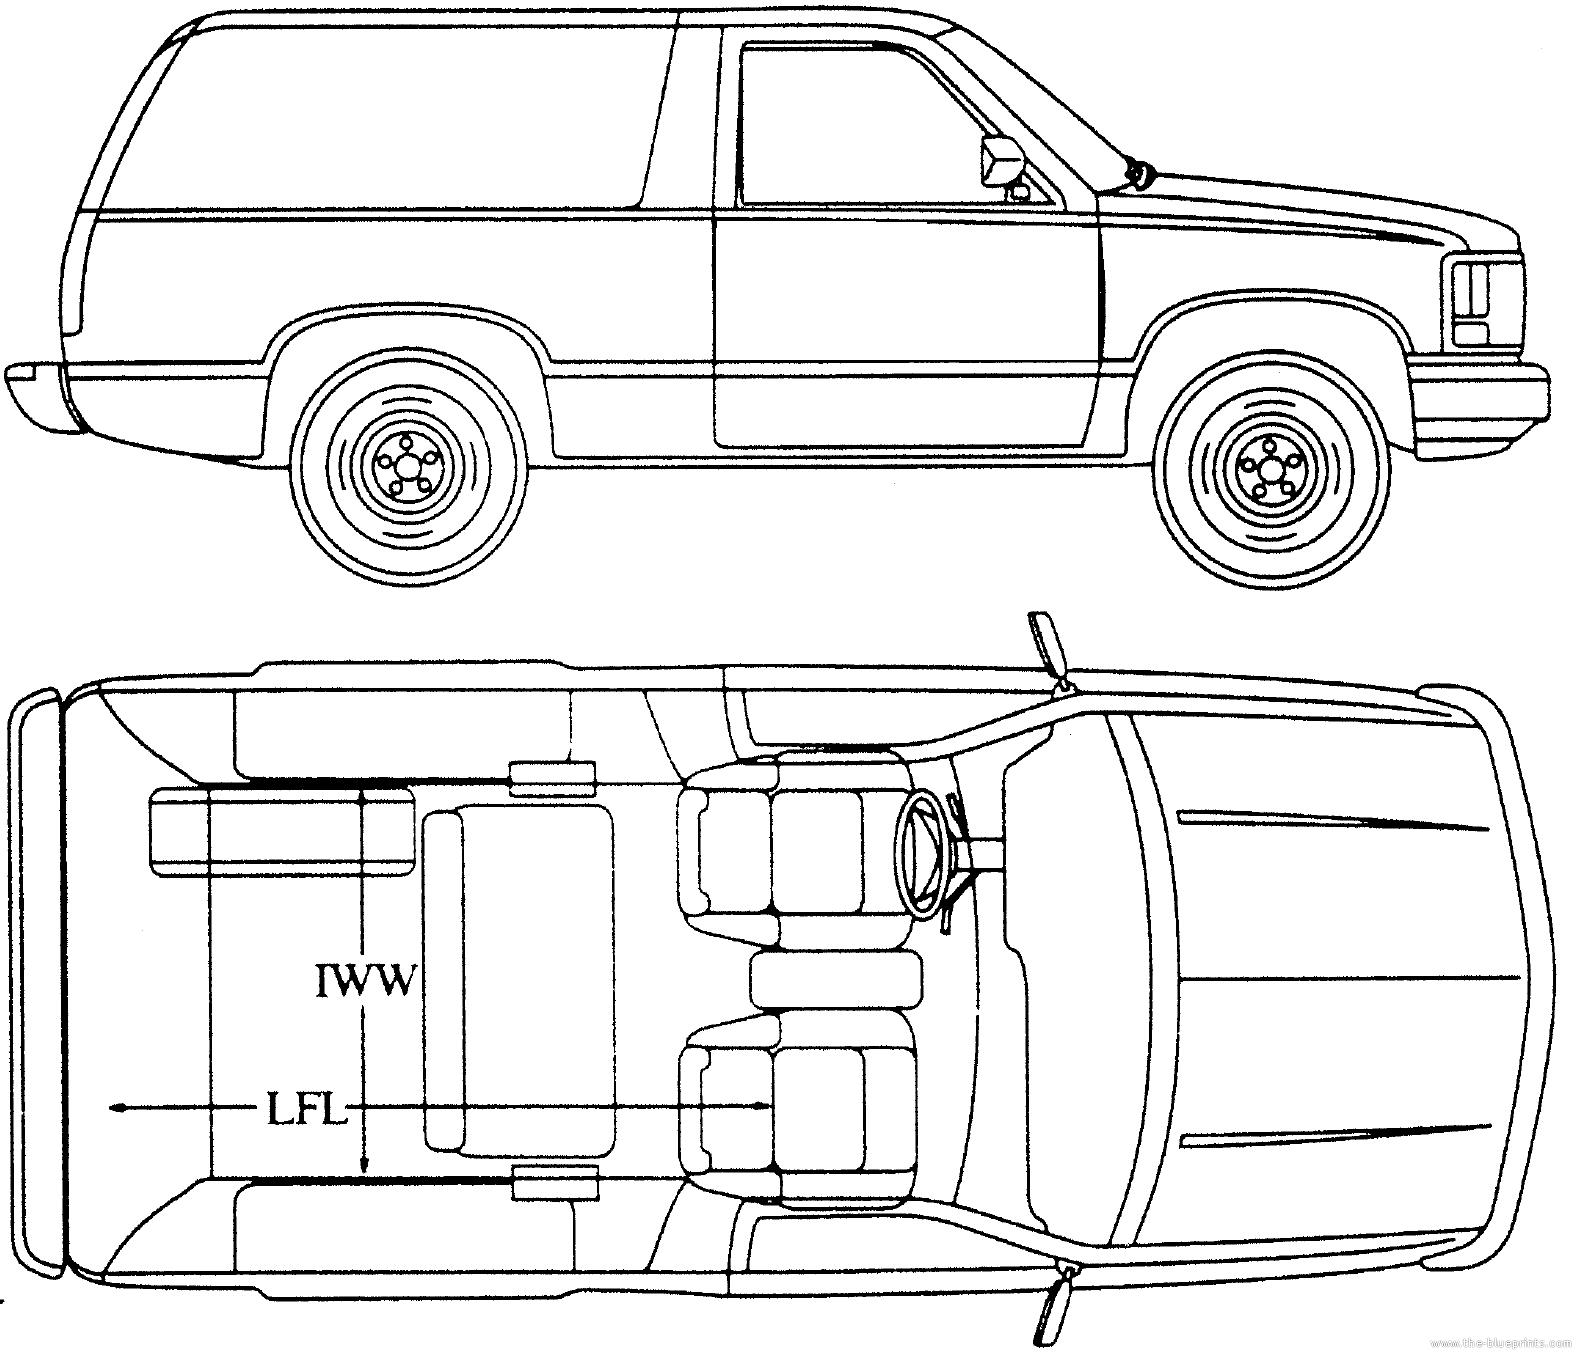 Blueprints Gt Cars Gt Chevrolet Gt Chevrolet Blazer